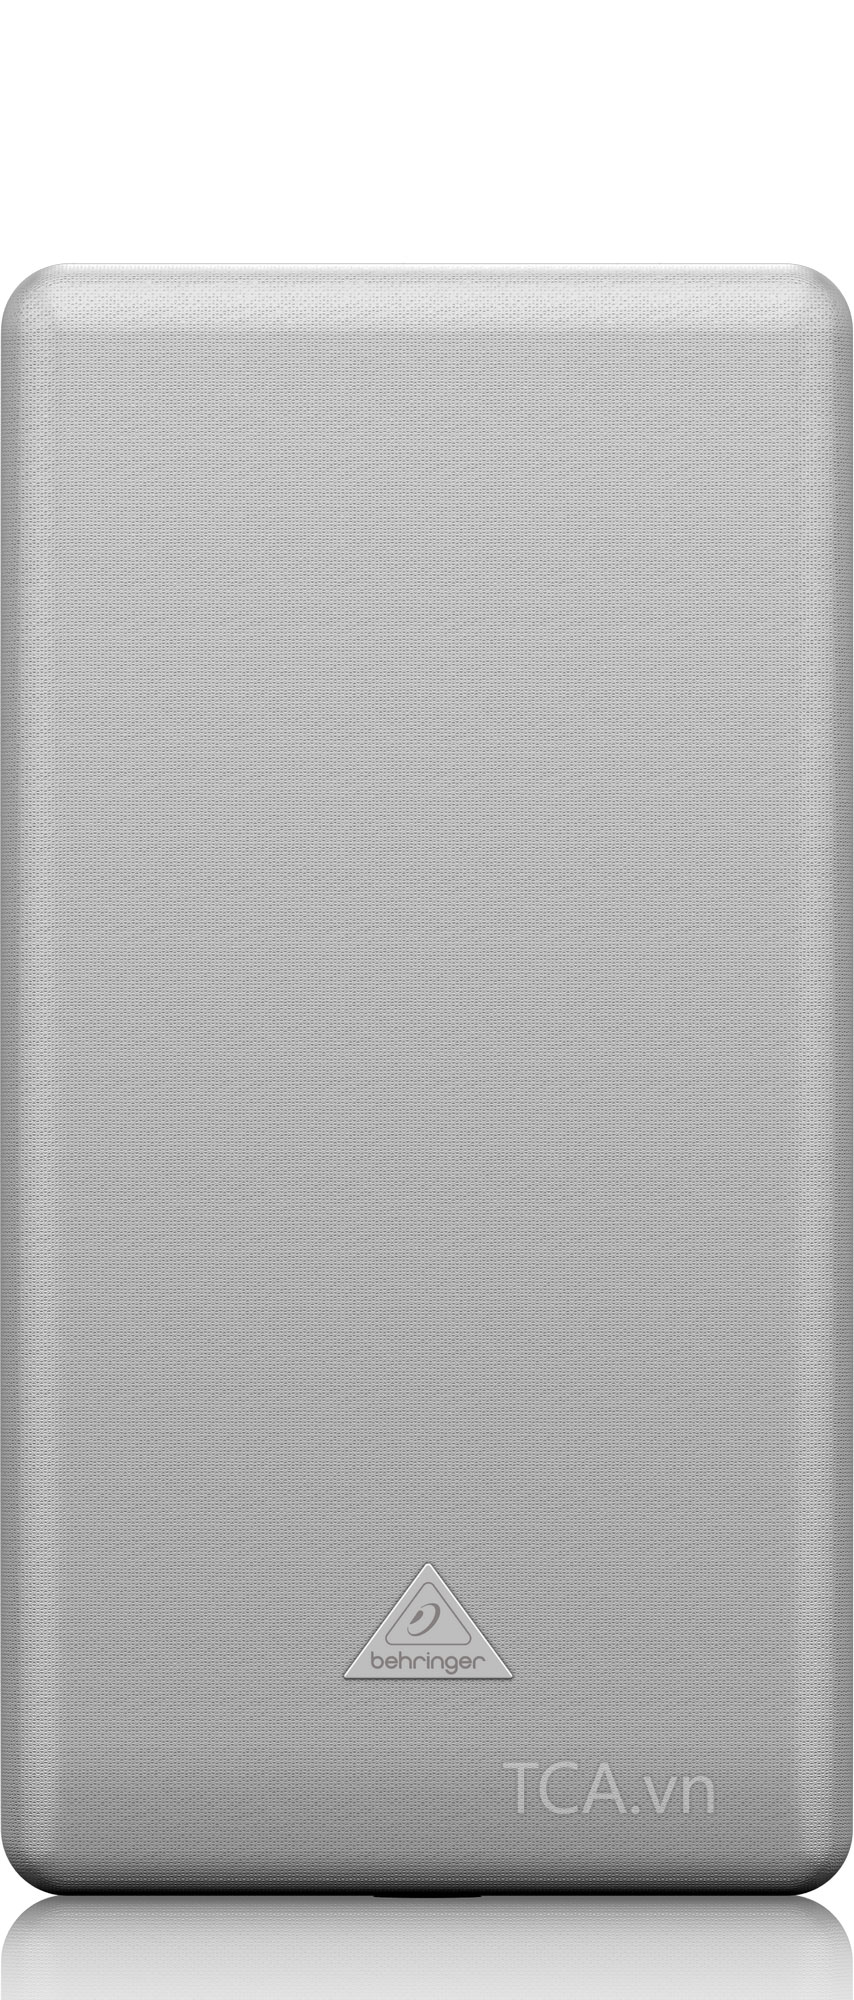 LOA Behringer EUROCOM CL2296-WH